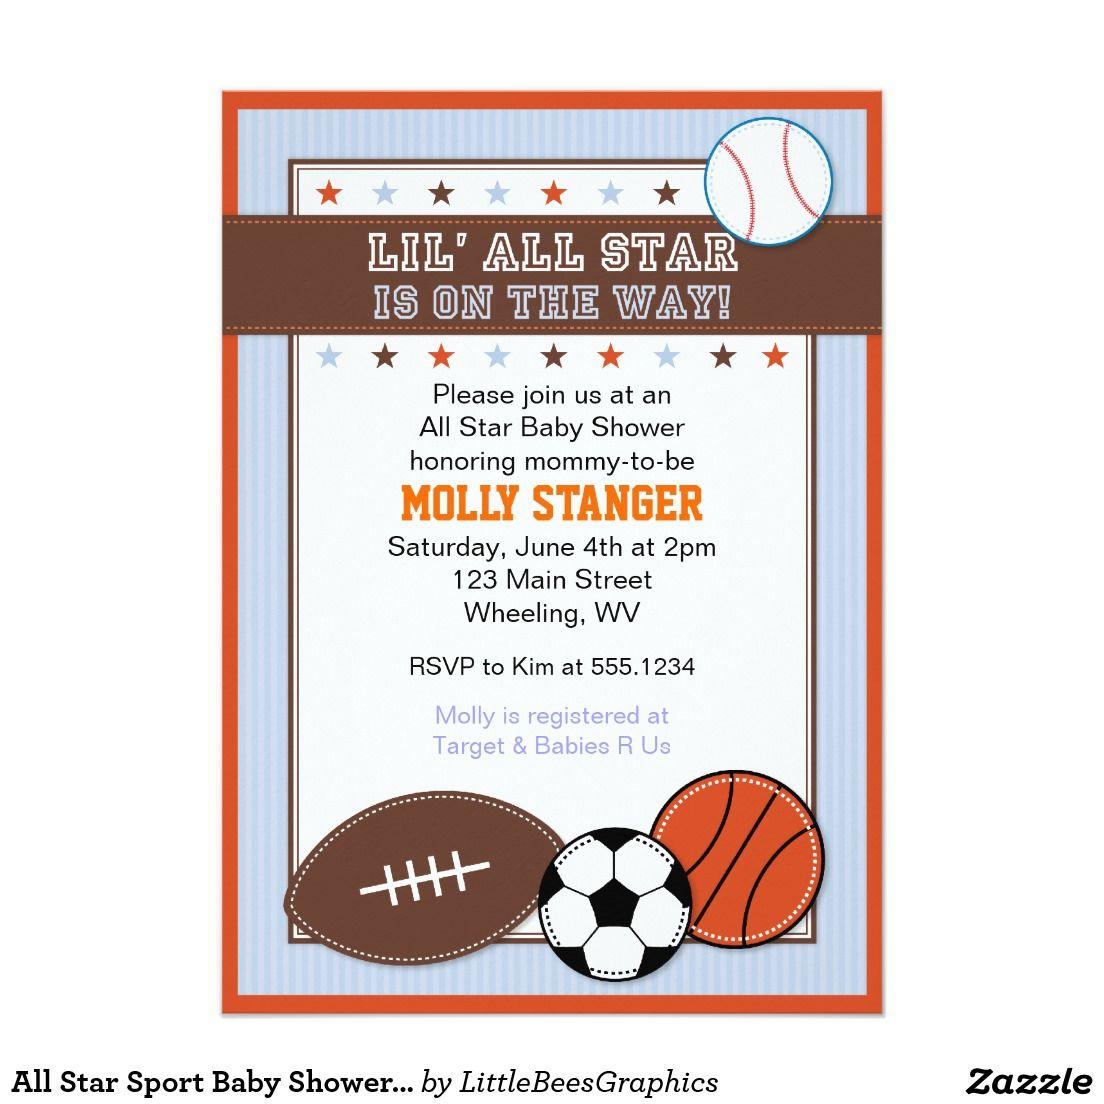 All Star Sport Baby Shower Invitation   Baby Shower Ideas ...